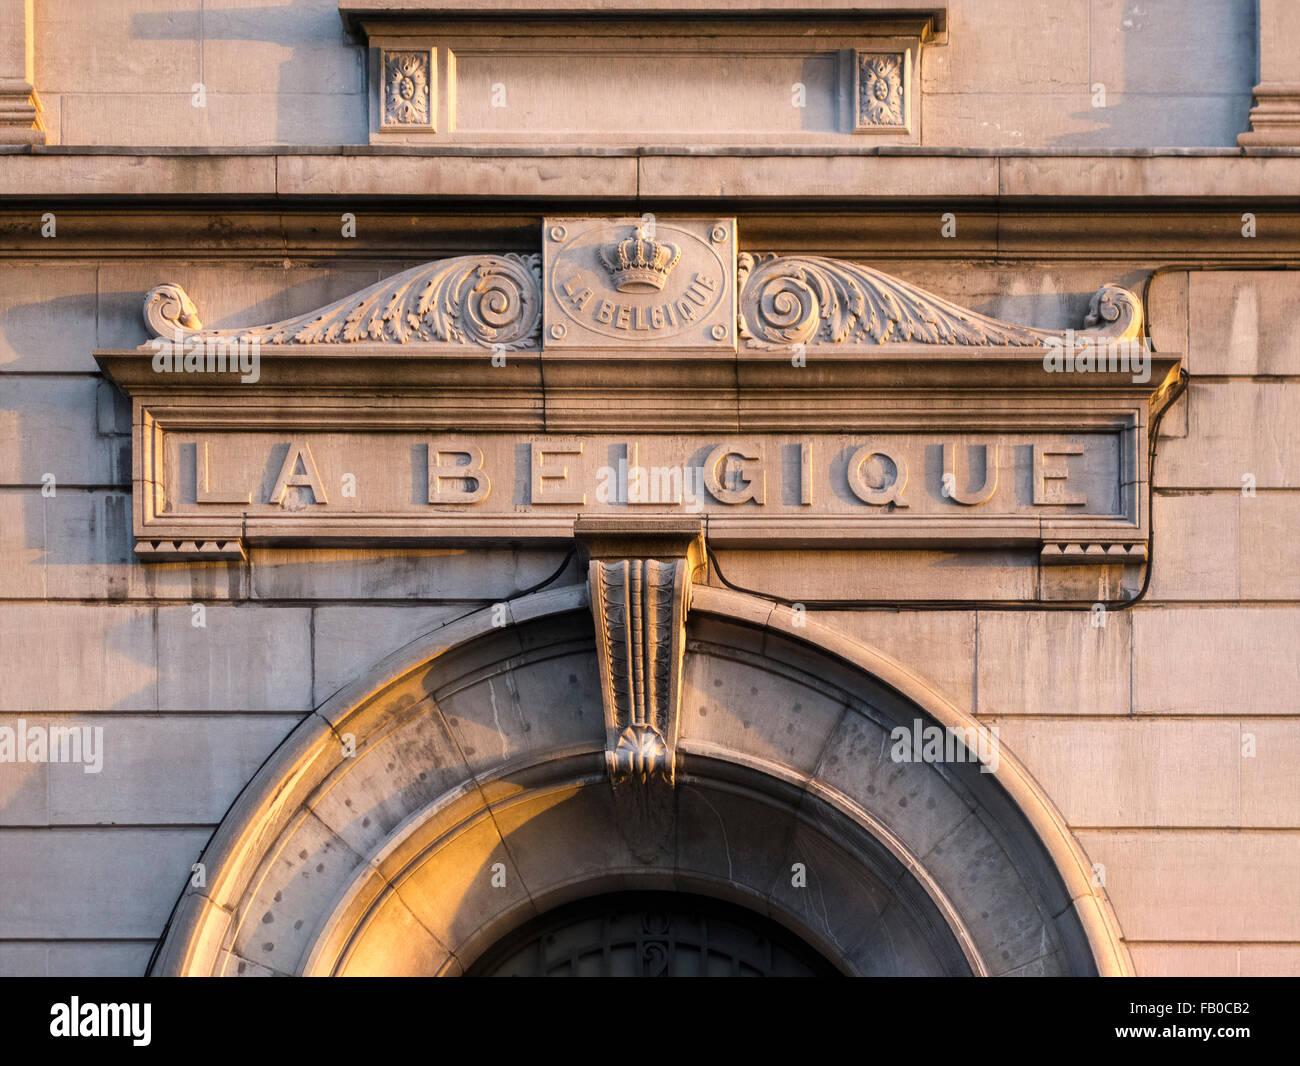 sign-belgium-crowned-inscription-la-belg